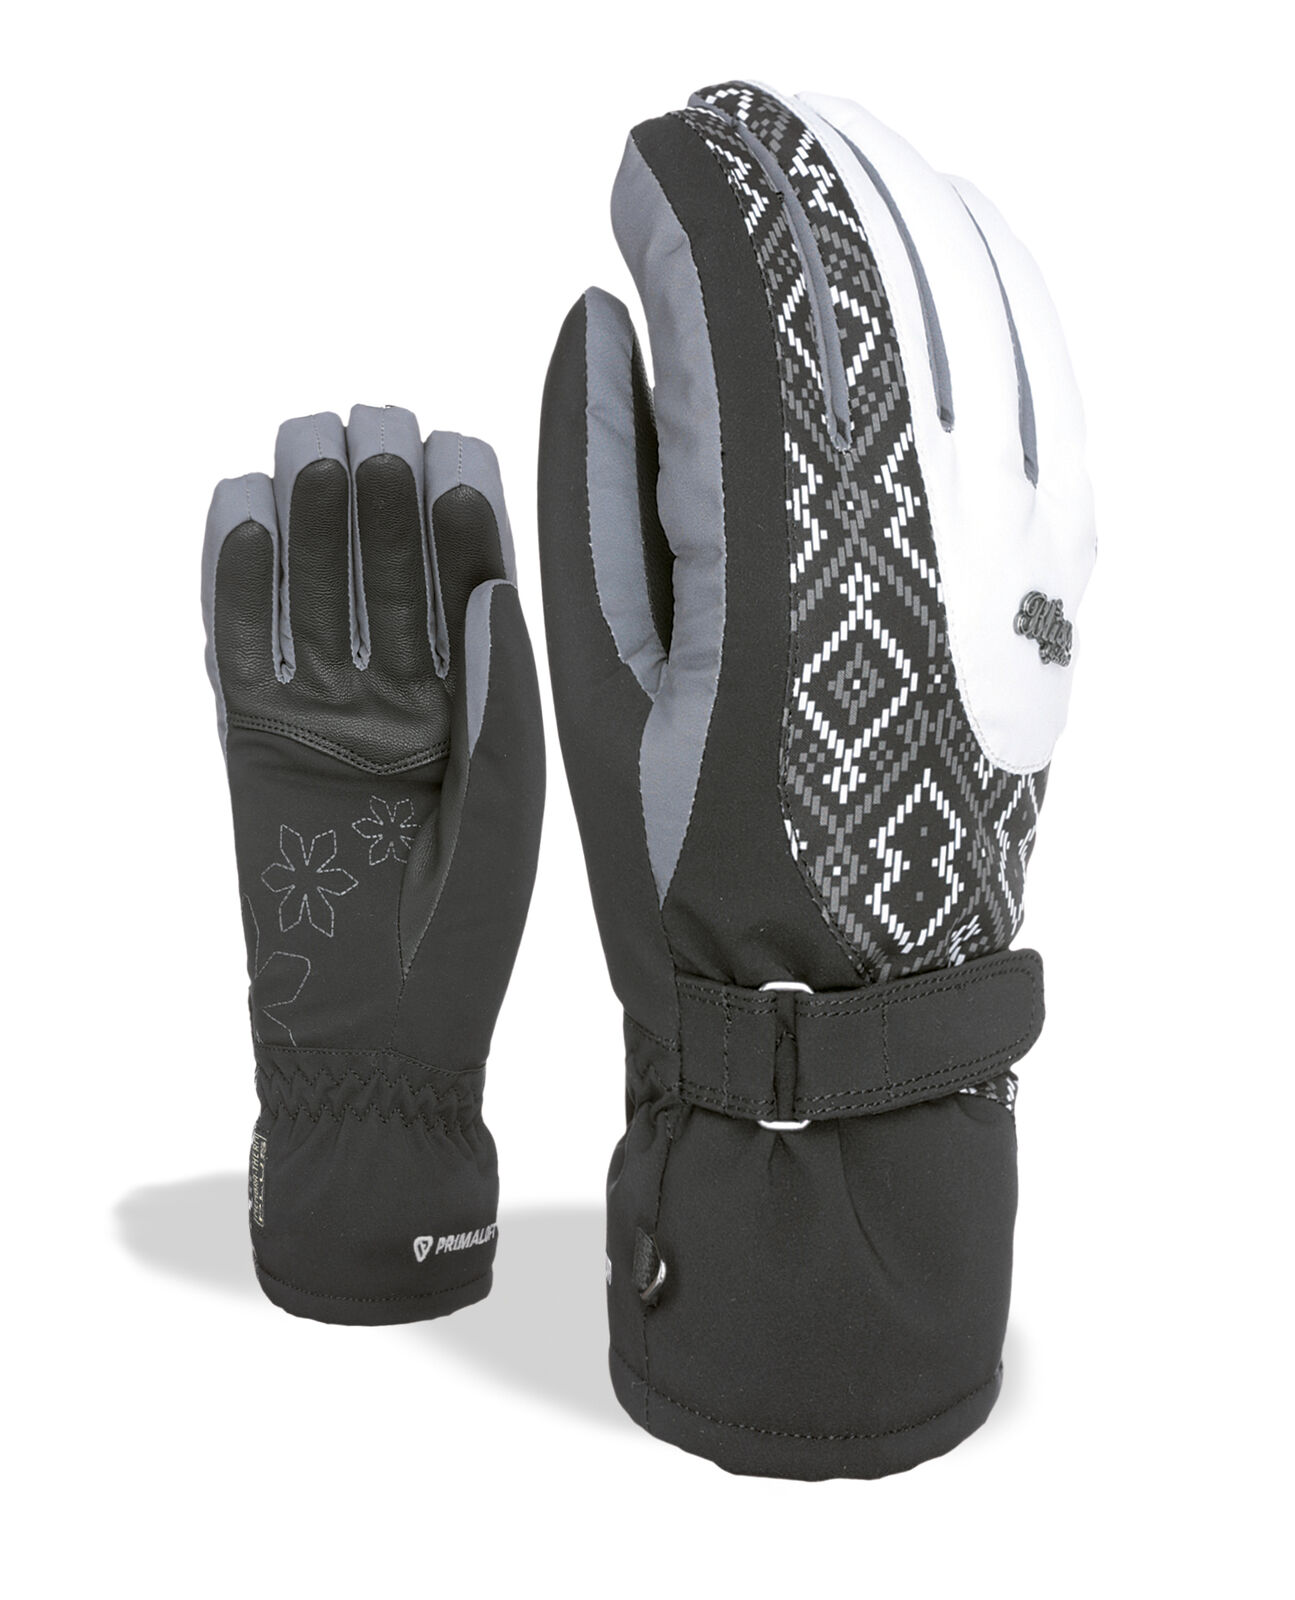 Level Handschuh Bliss Venus black wasserdicht atmungsaktiv wärmend